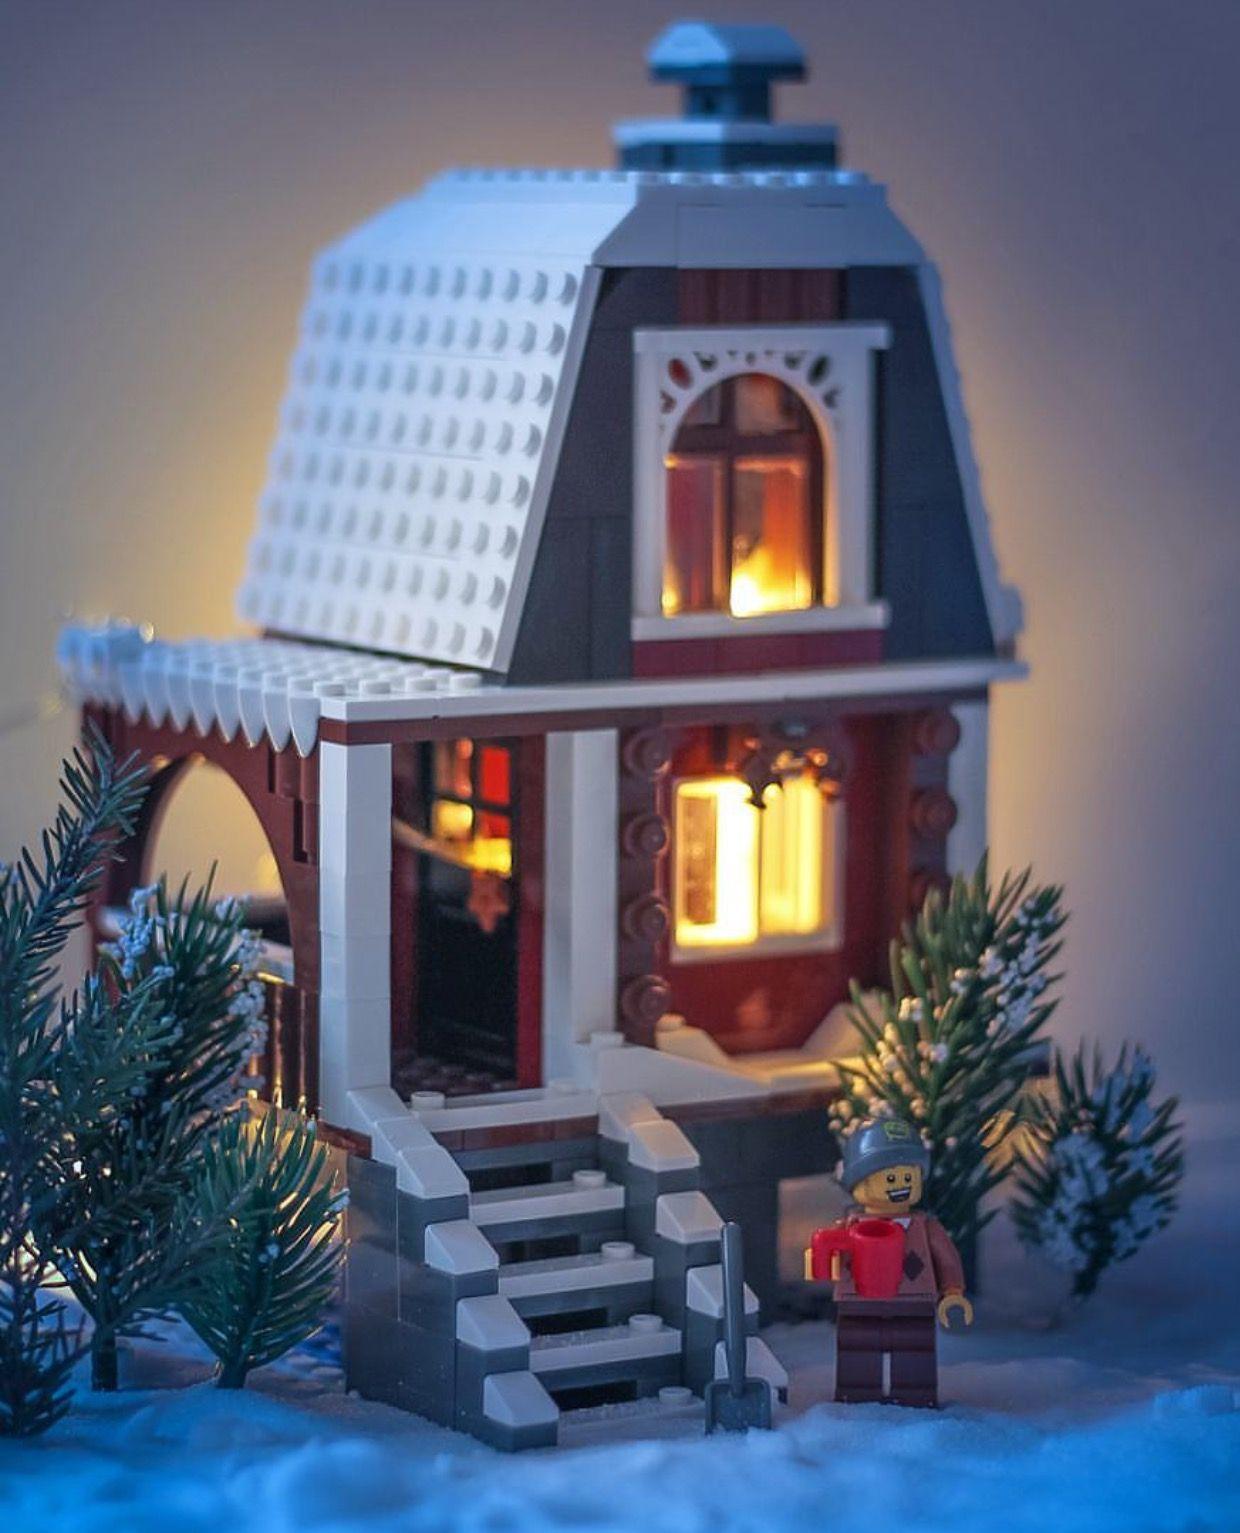 A Lego Winter Cottage Lego Winter Lego House Lego Christmas